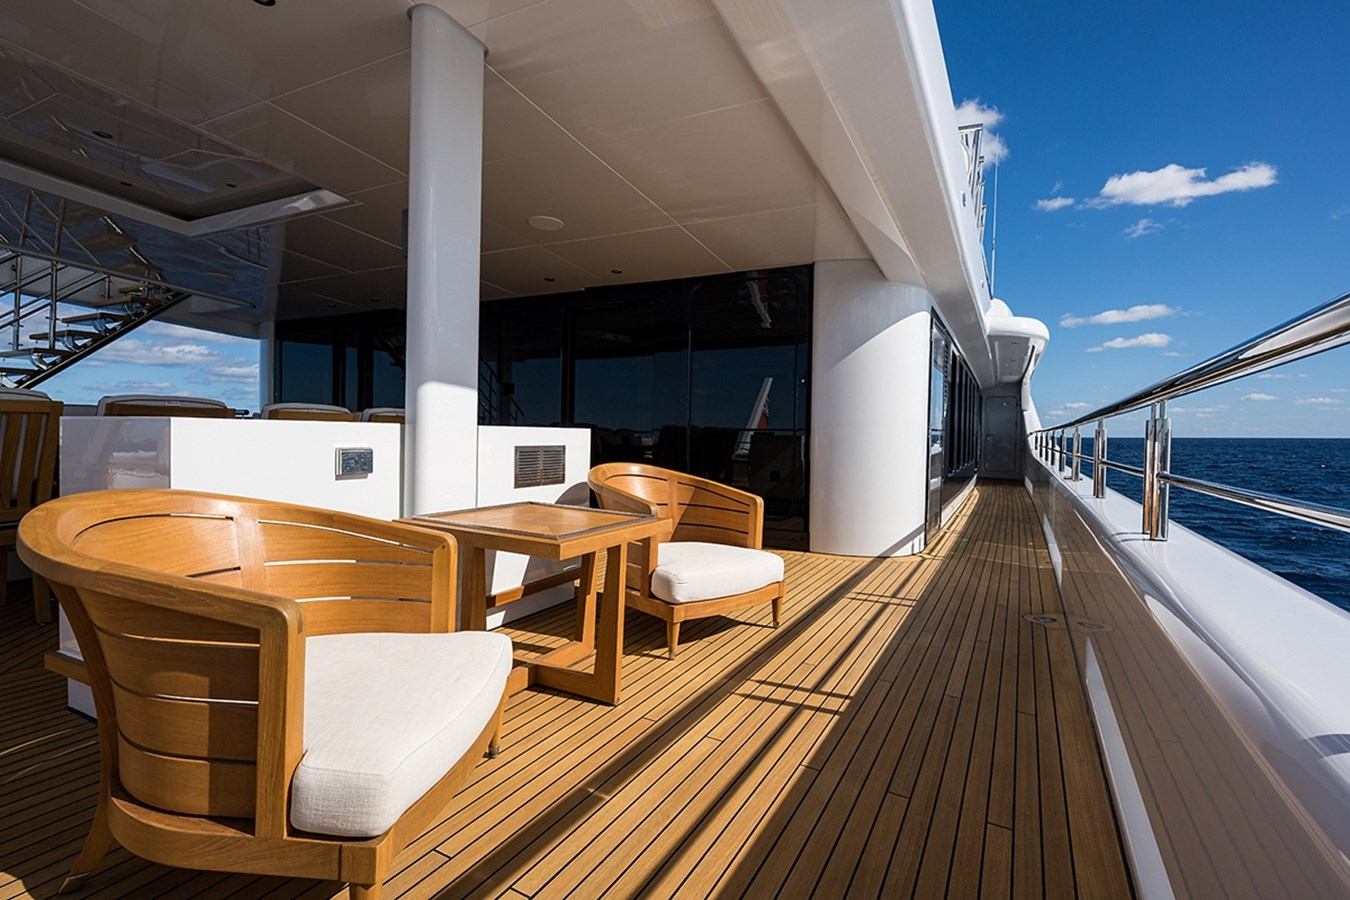 Quantum of Solace_skylounge_aft_deck_7 2012 TURQUOISE YACHTS  Mega Yacht 2939341